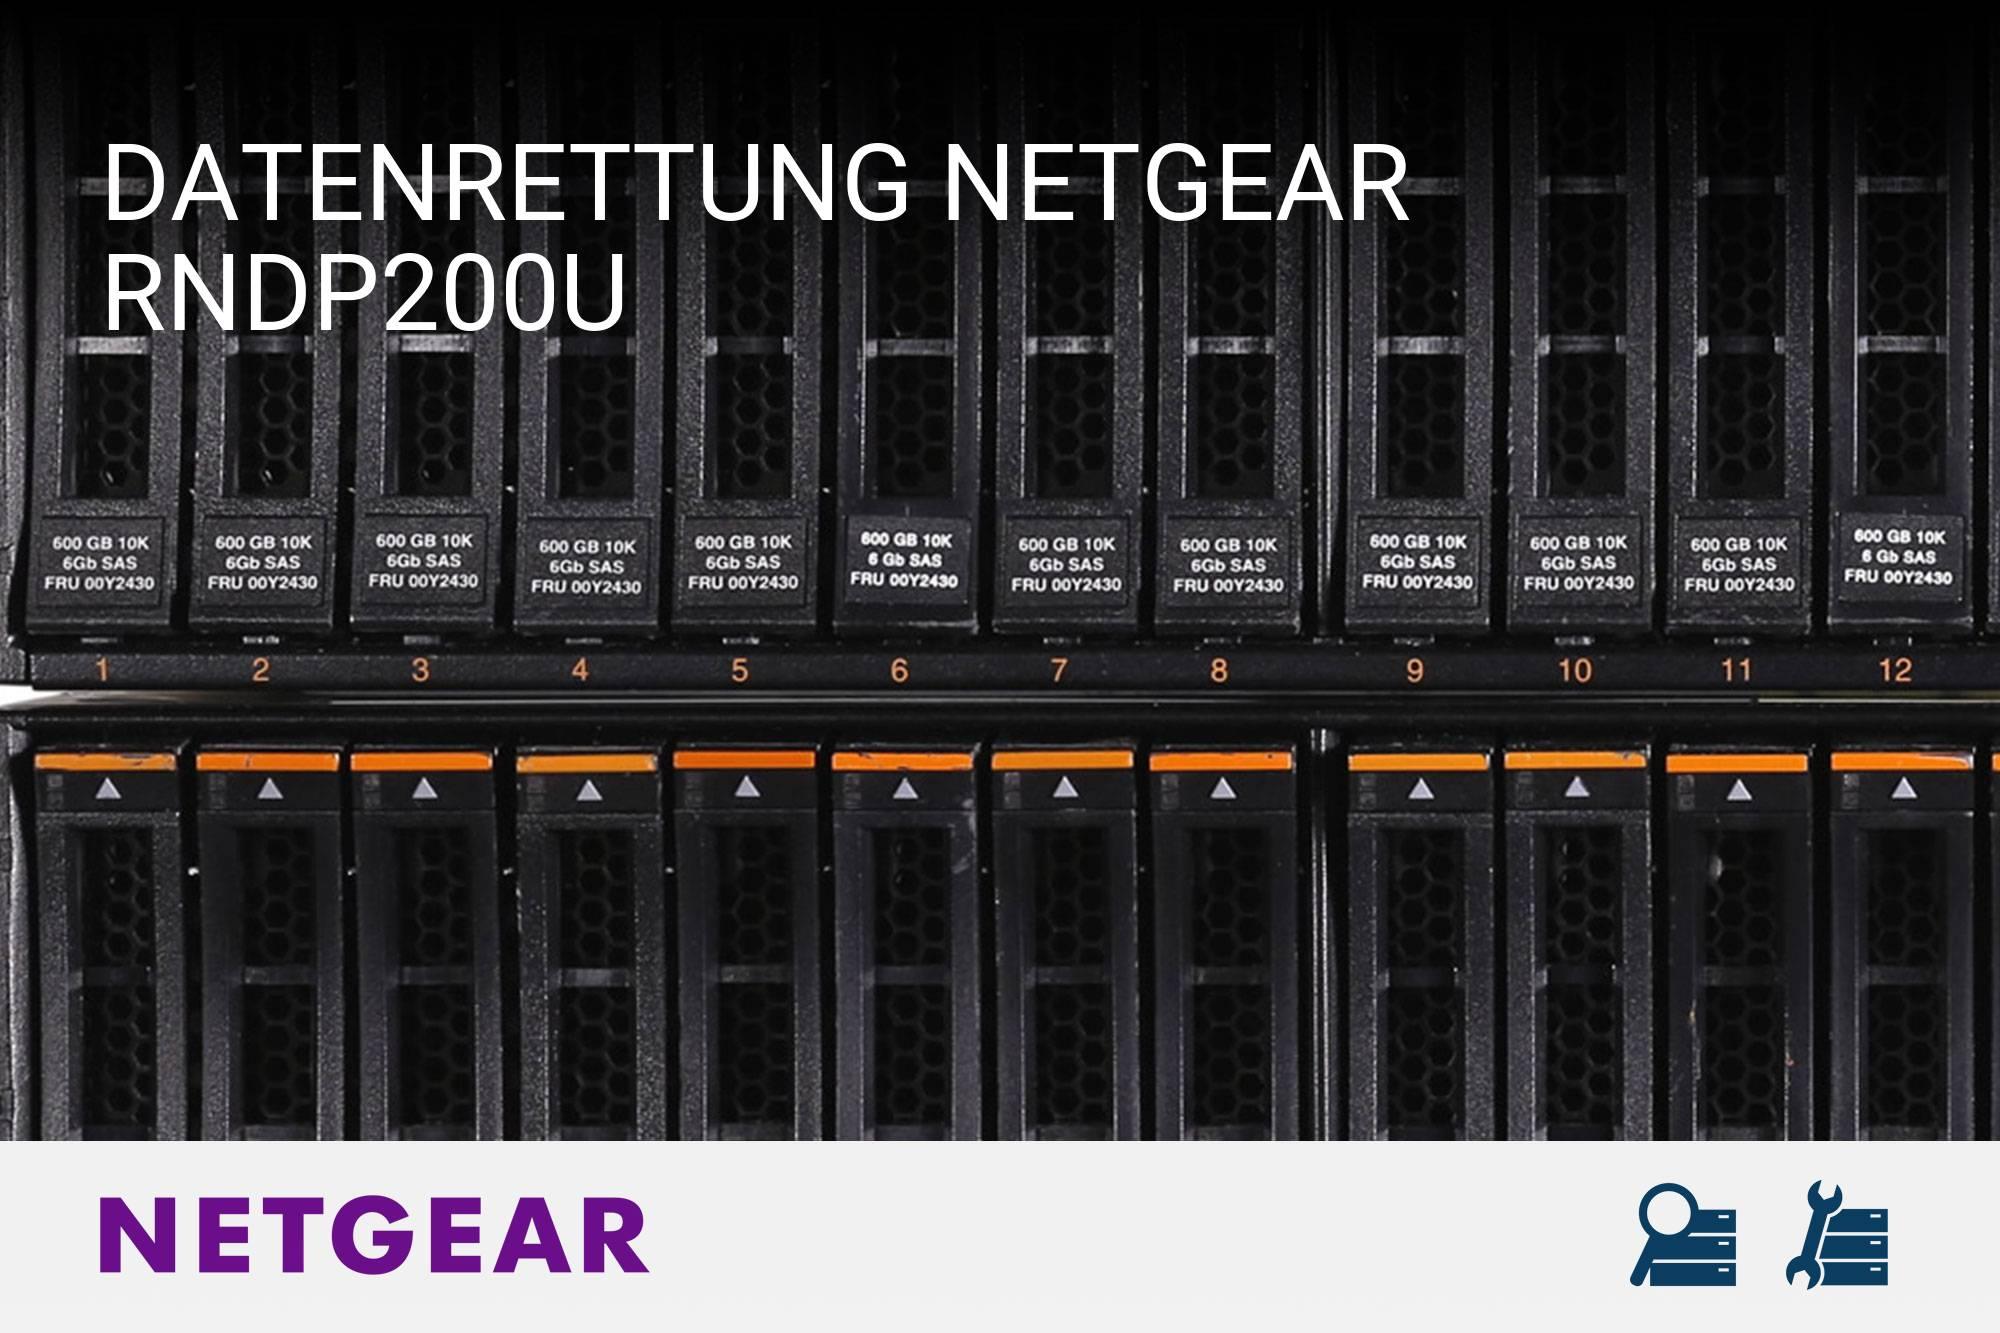 Netgear RNDP200U